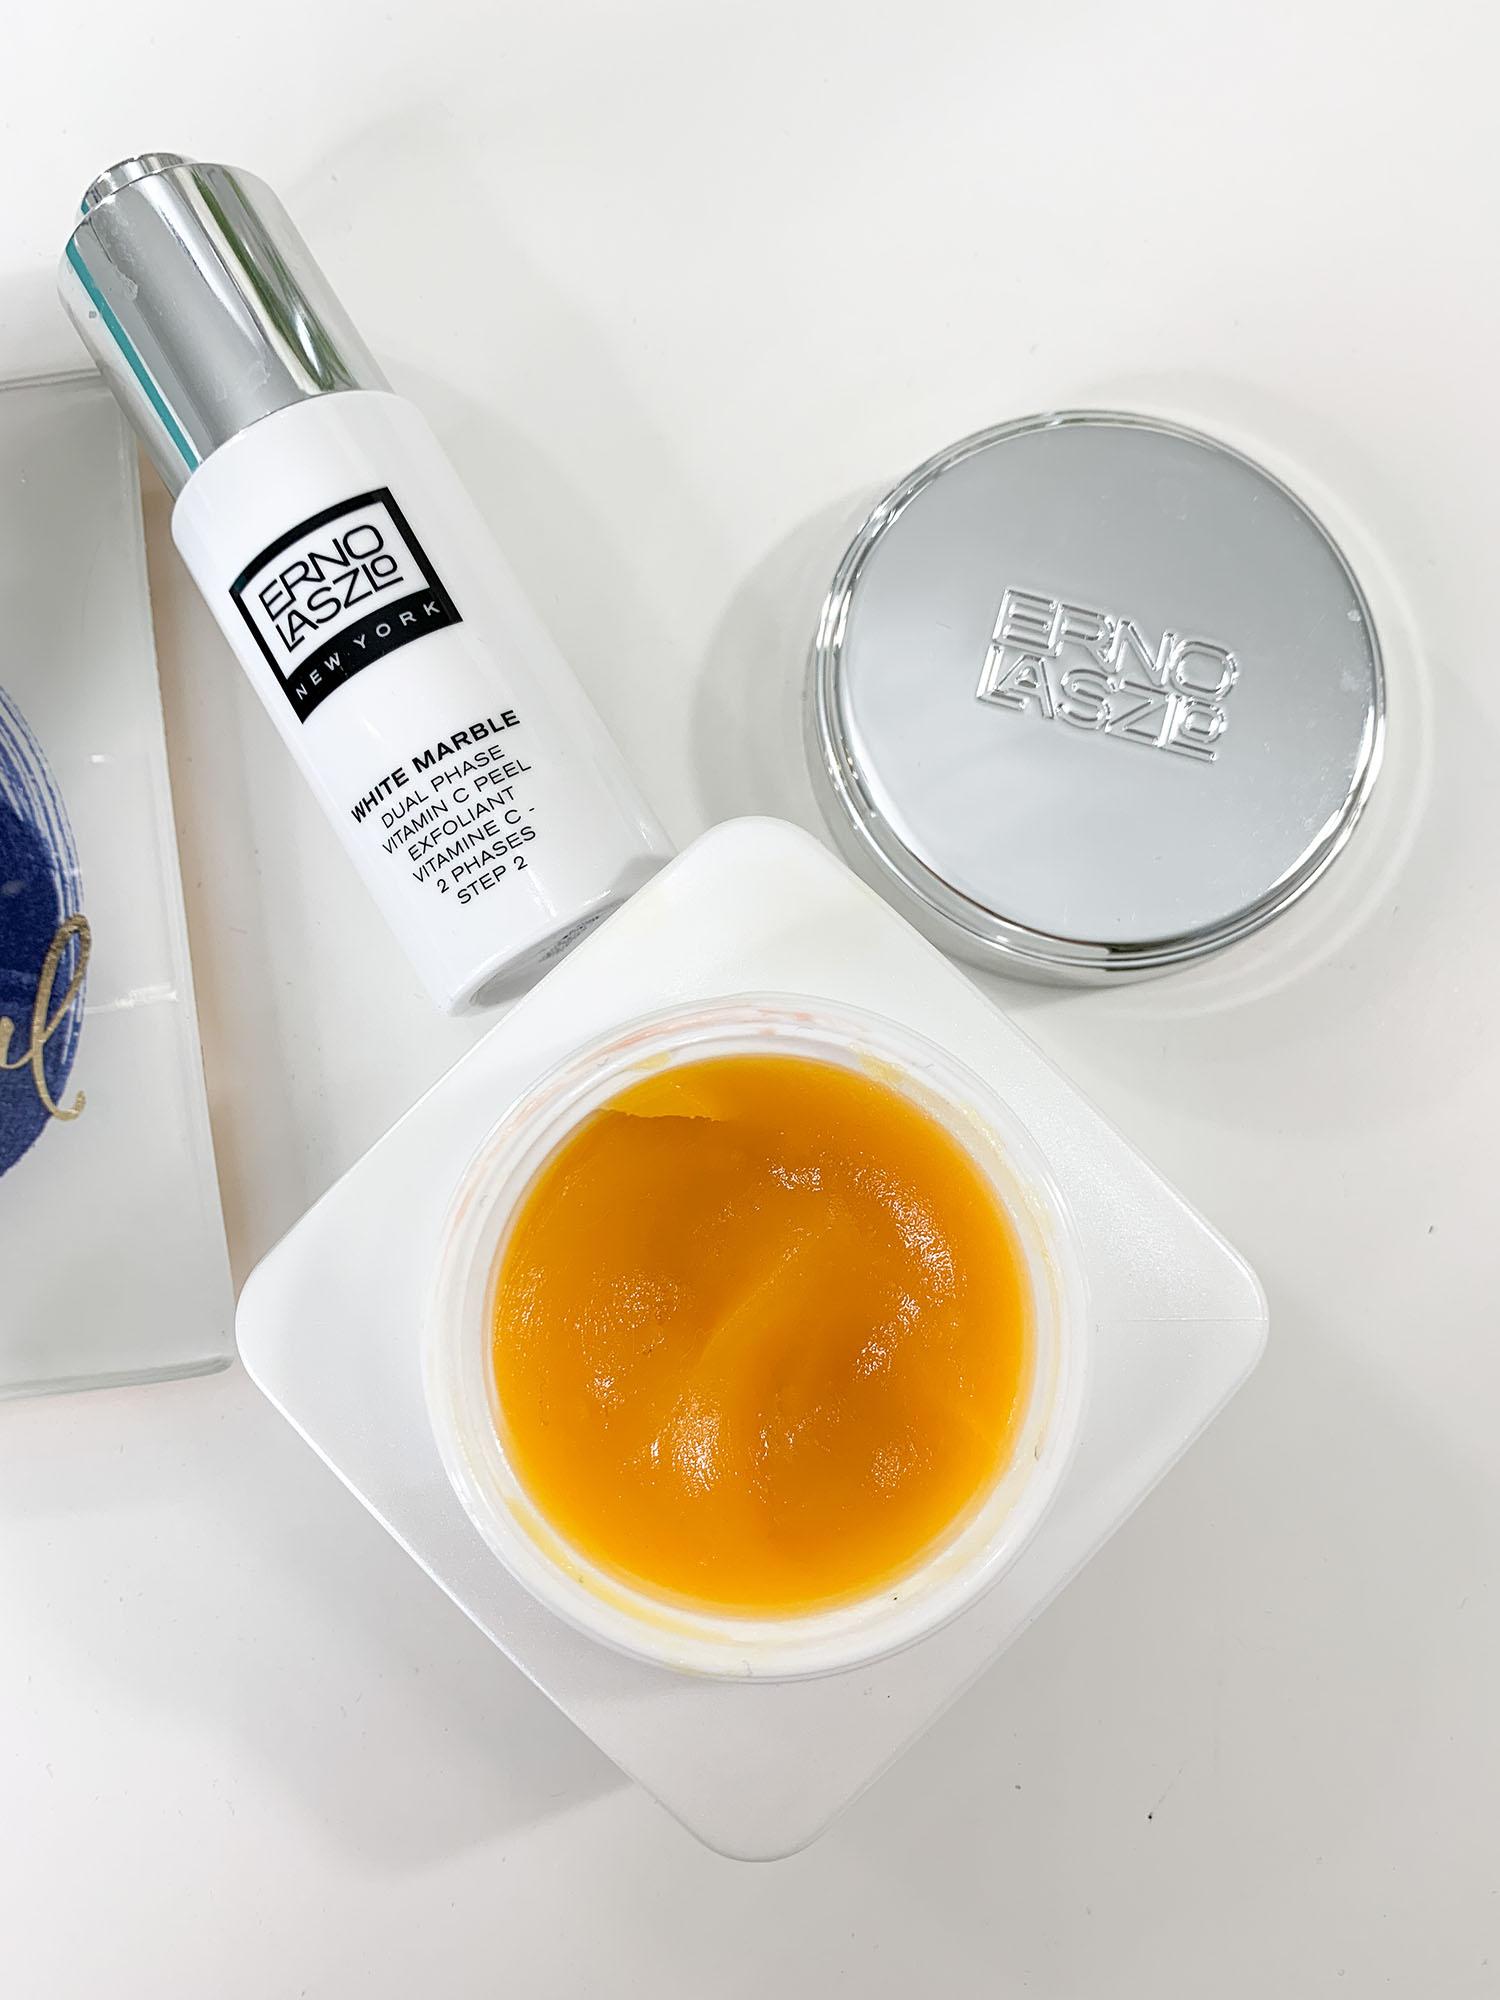 Dual Phase Vitamin C-Peel, Erno Laszlo